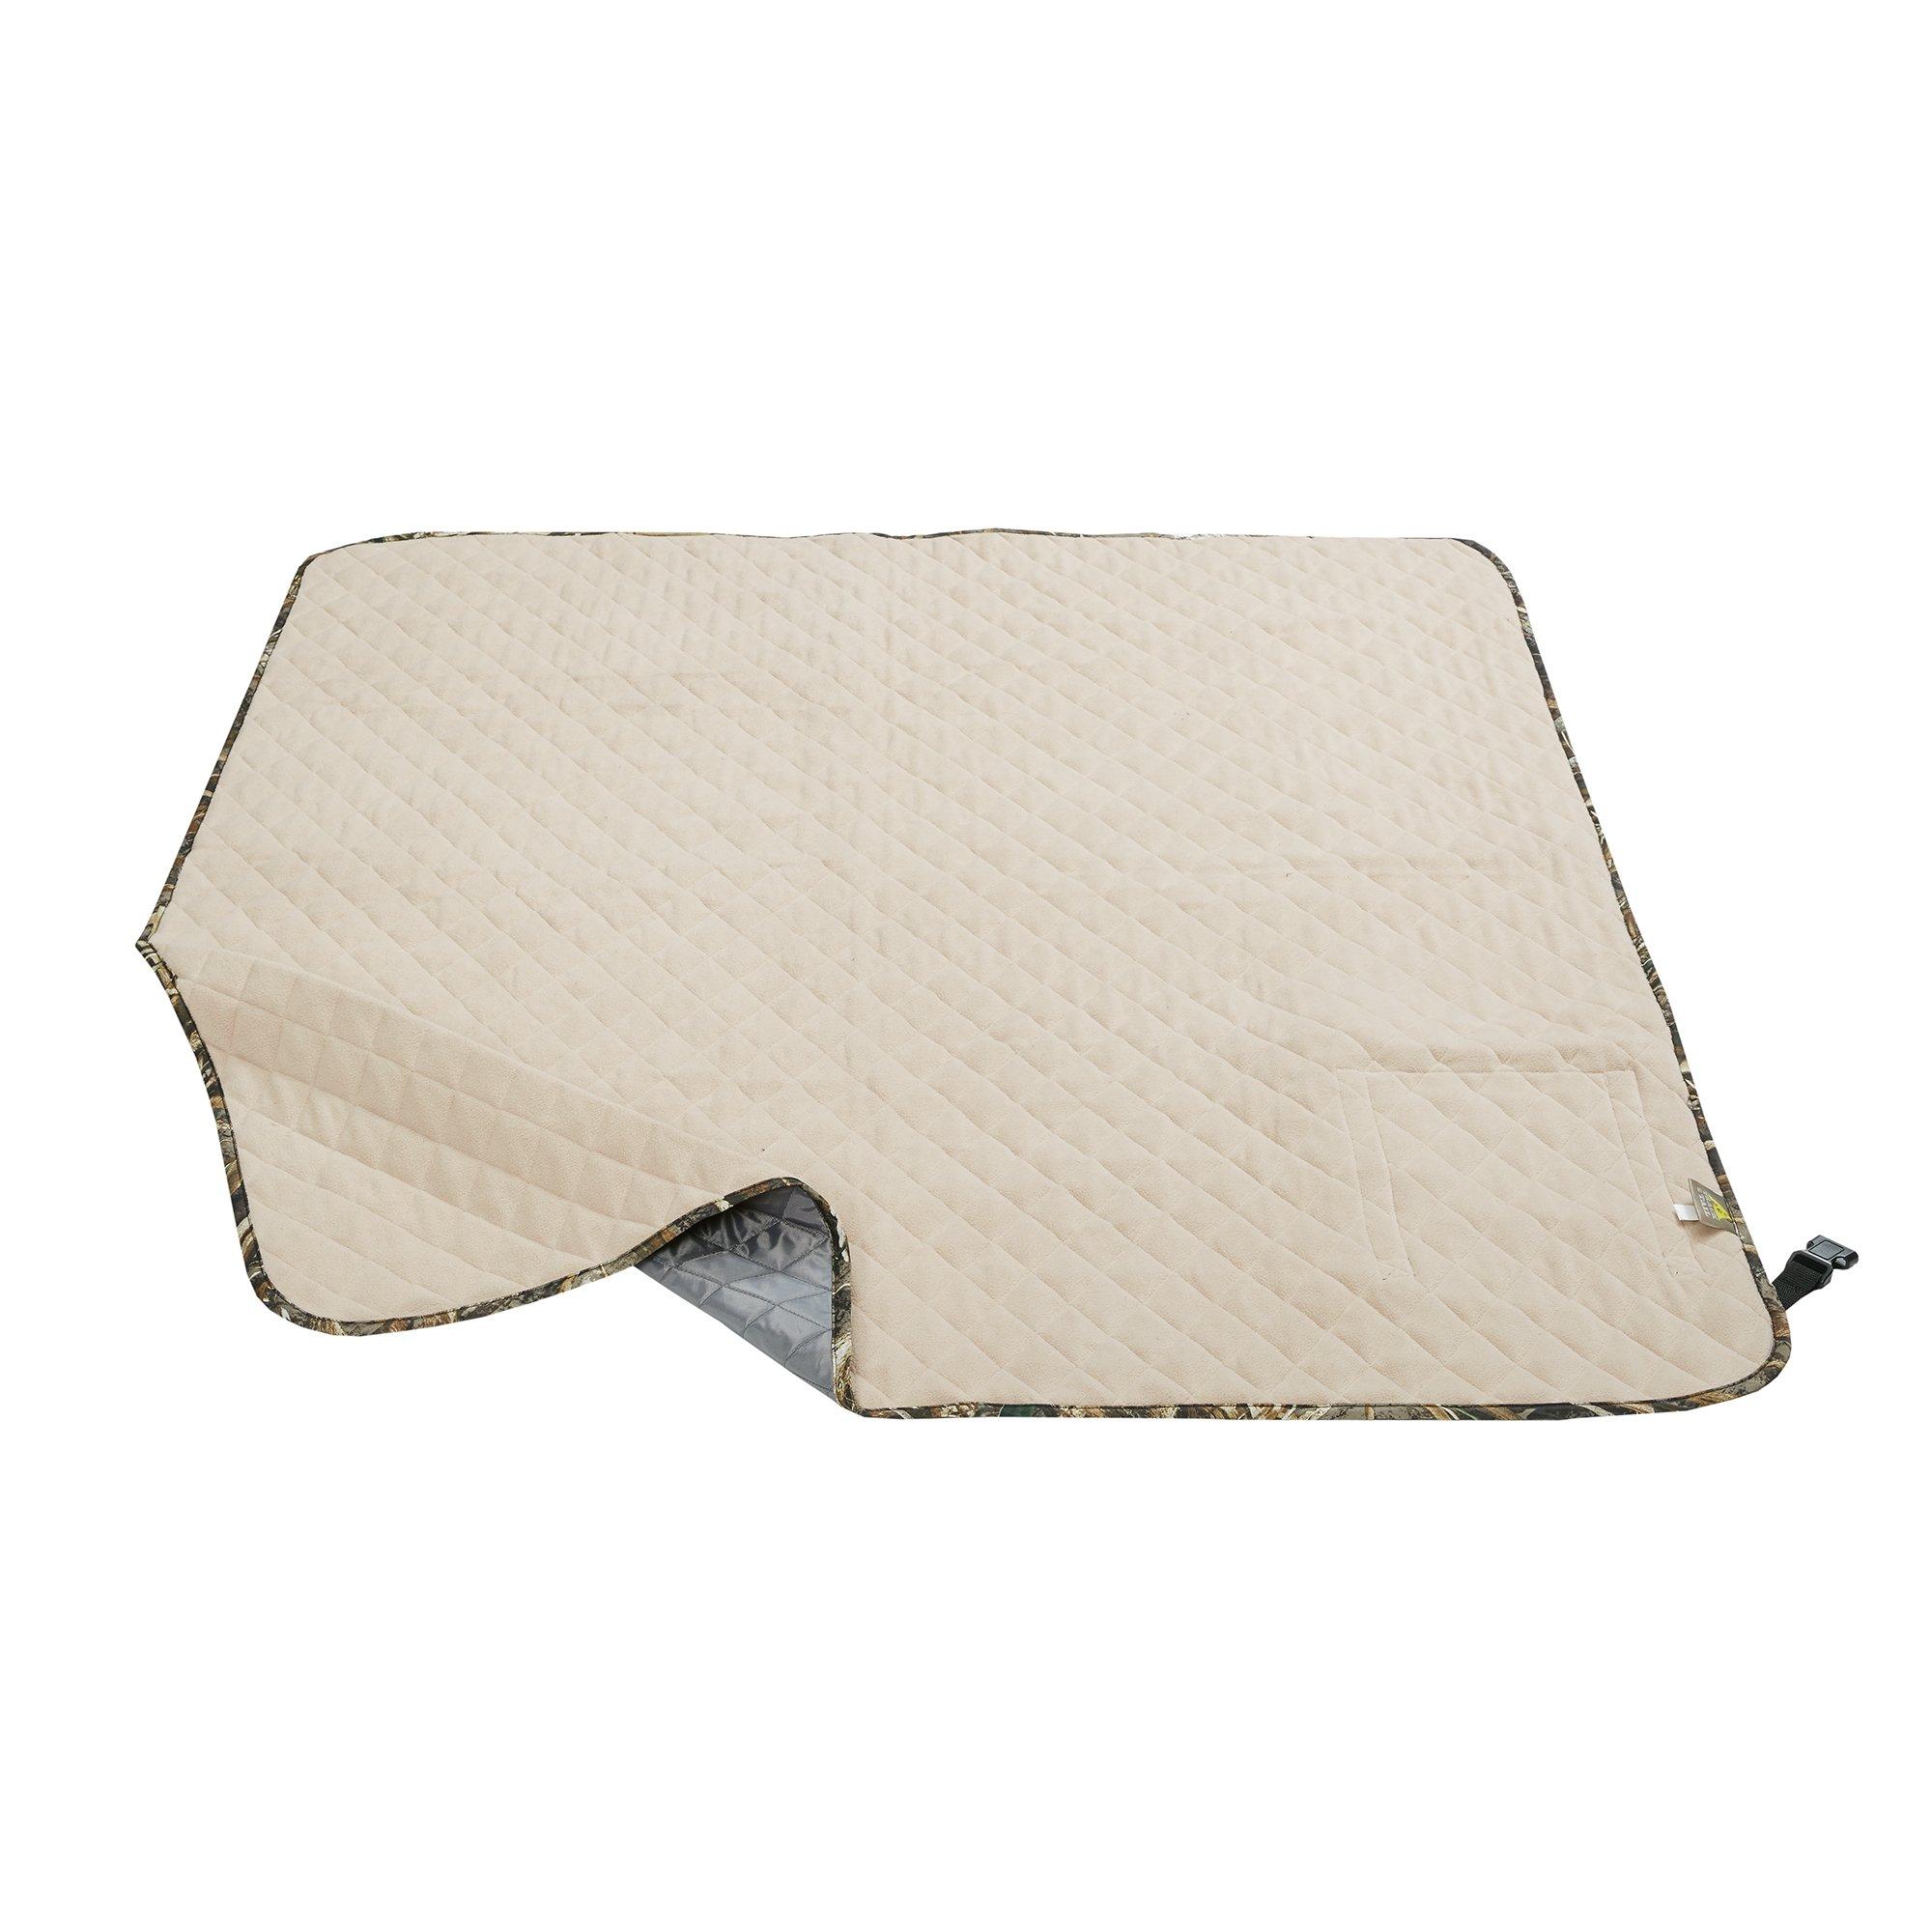 JLA Reversible Fleece Travel Blanket